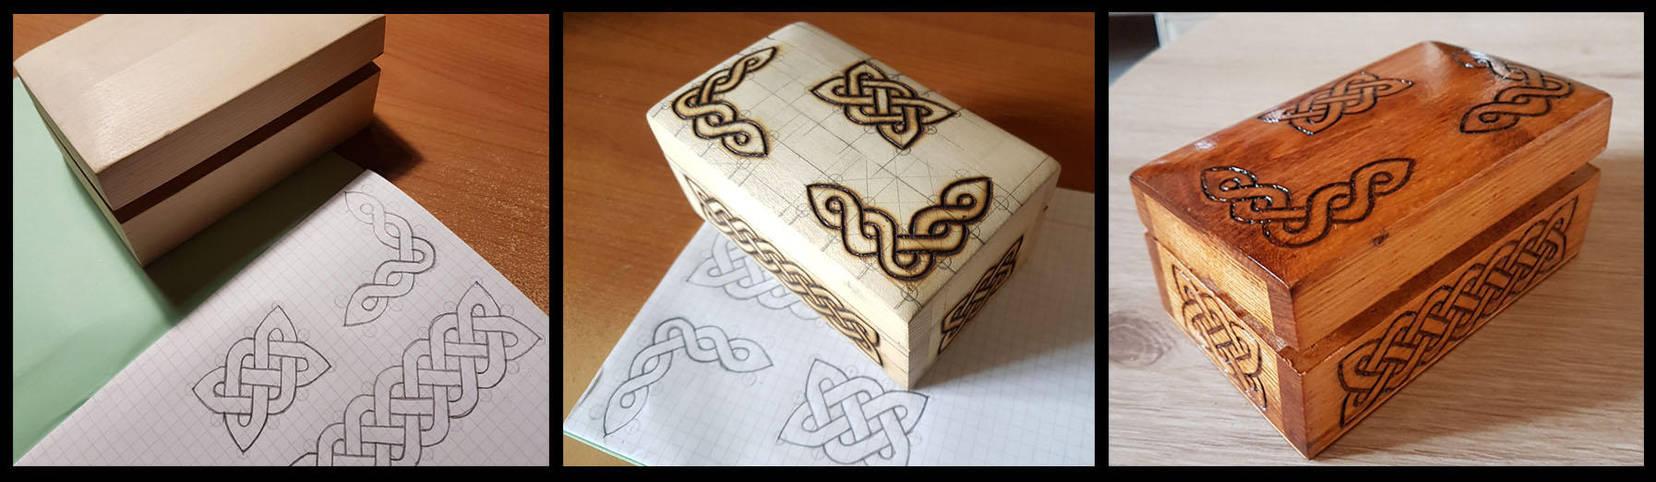 My Box by Valdemaras